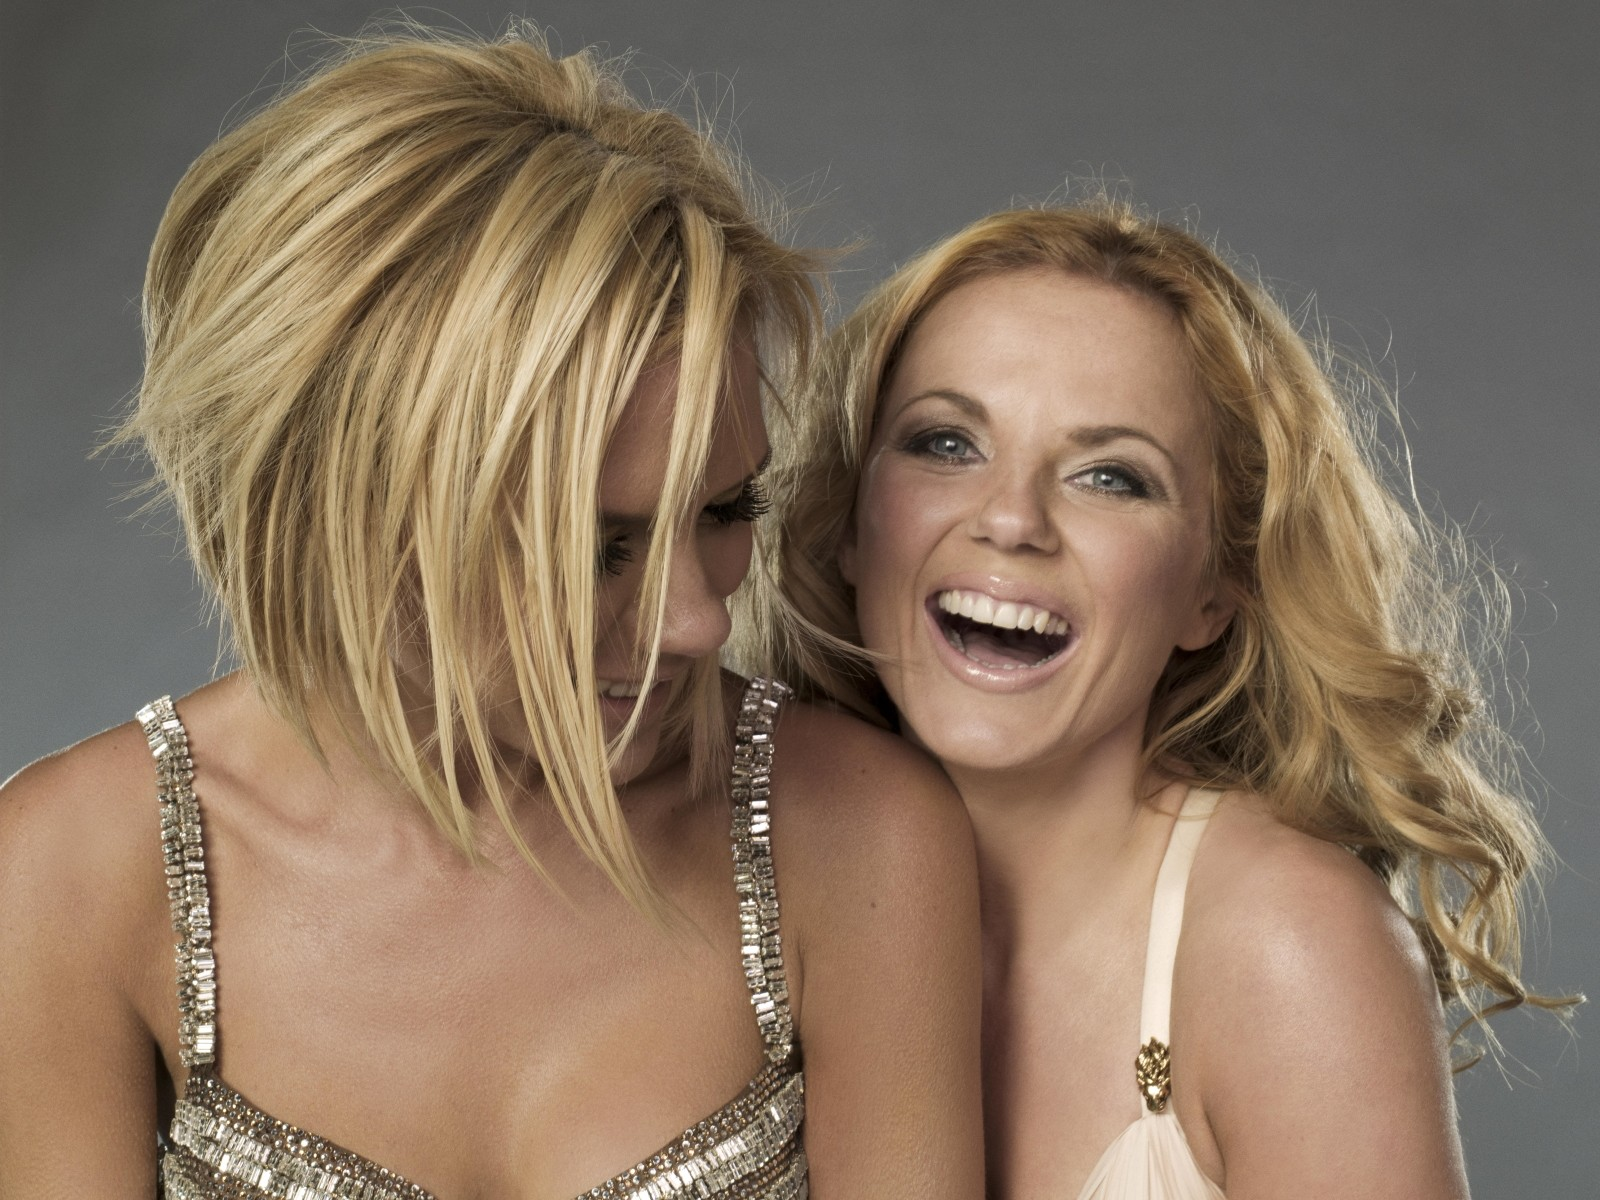 http://4.bp.blogspot.com/_VnPnJLQ-U7s/TBrQFBSnnVI/AAAAAAAAHwg/hTugtty6BQQ/s1600/The_Spice_Girls_8238.jpg